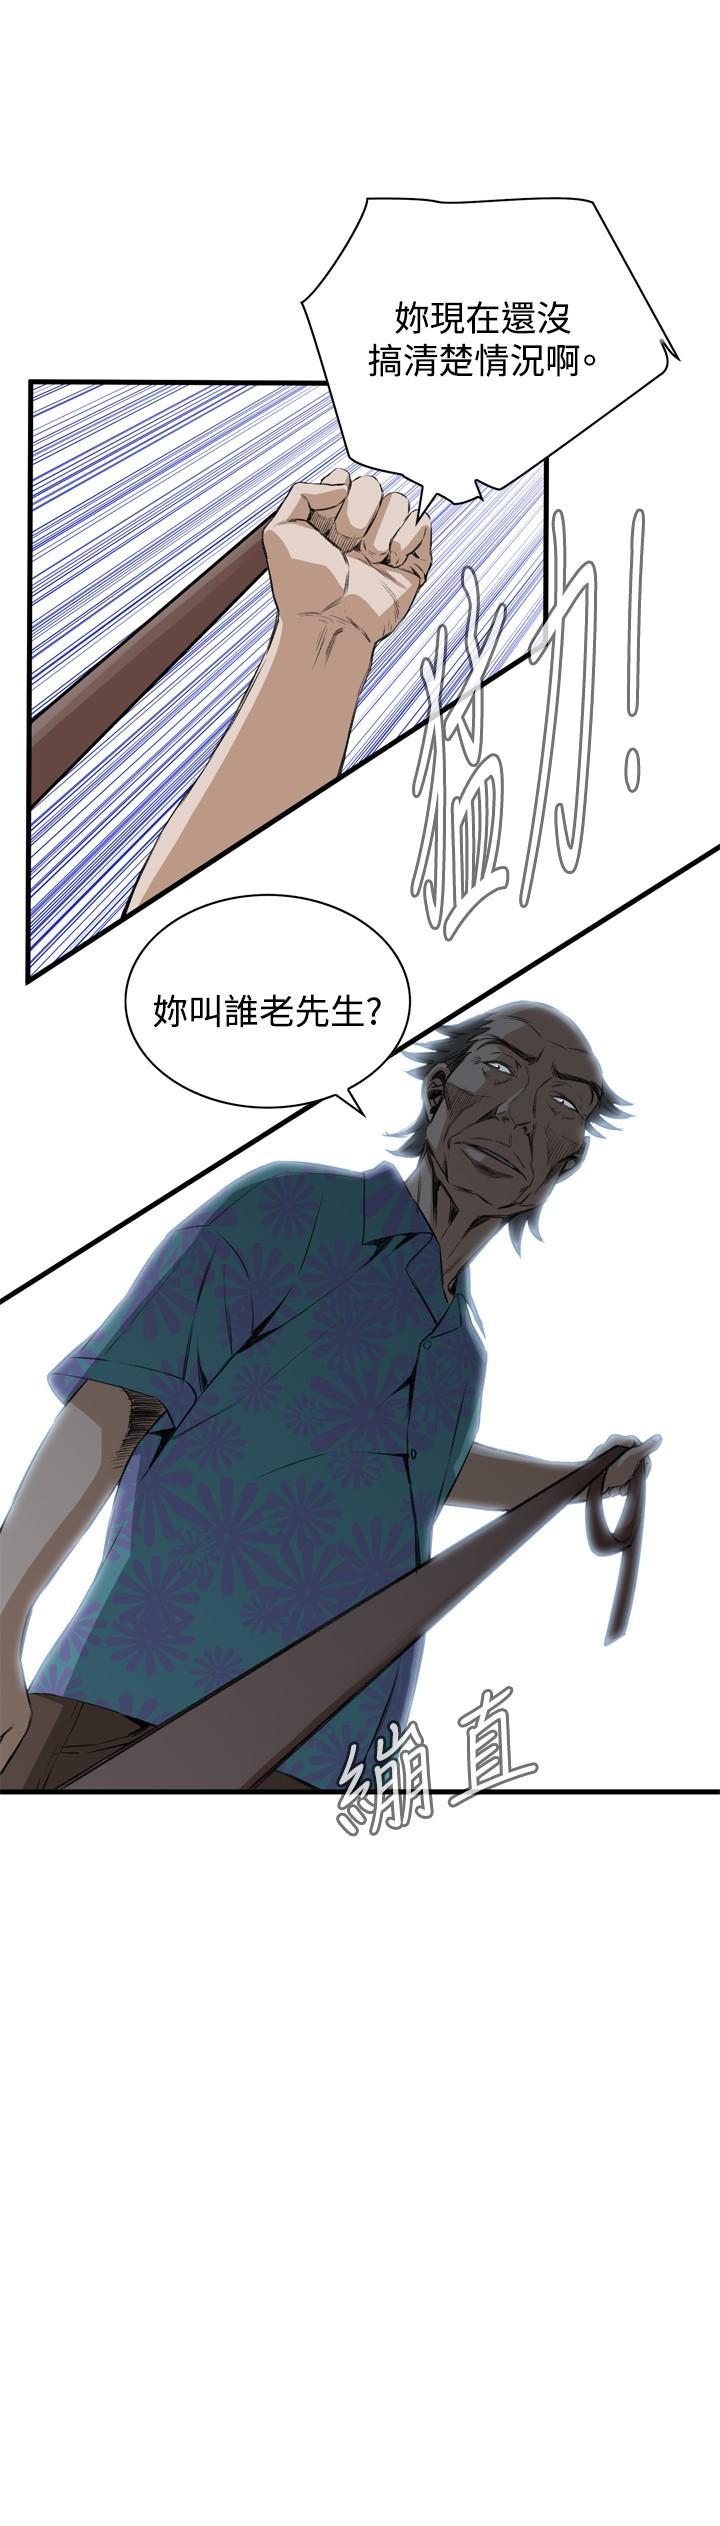 Take a Peek 偷窥 Ch.39~51 [Chinese]中文 269